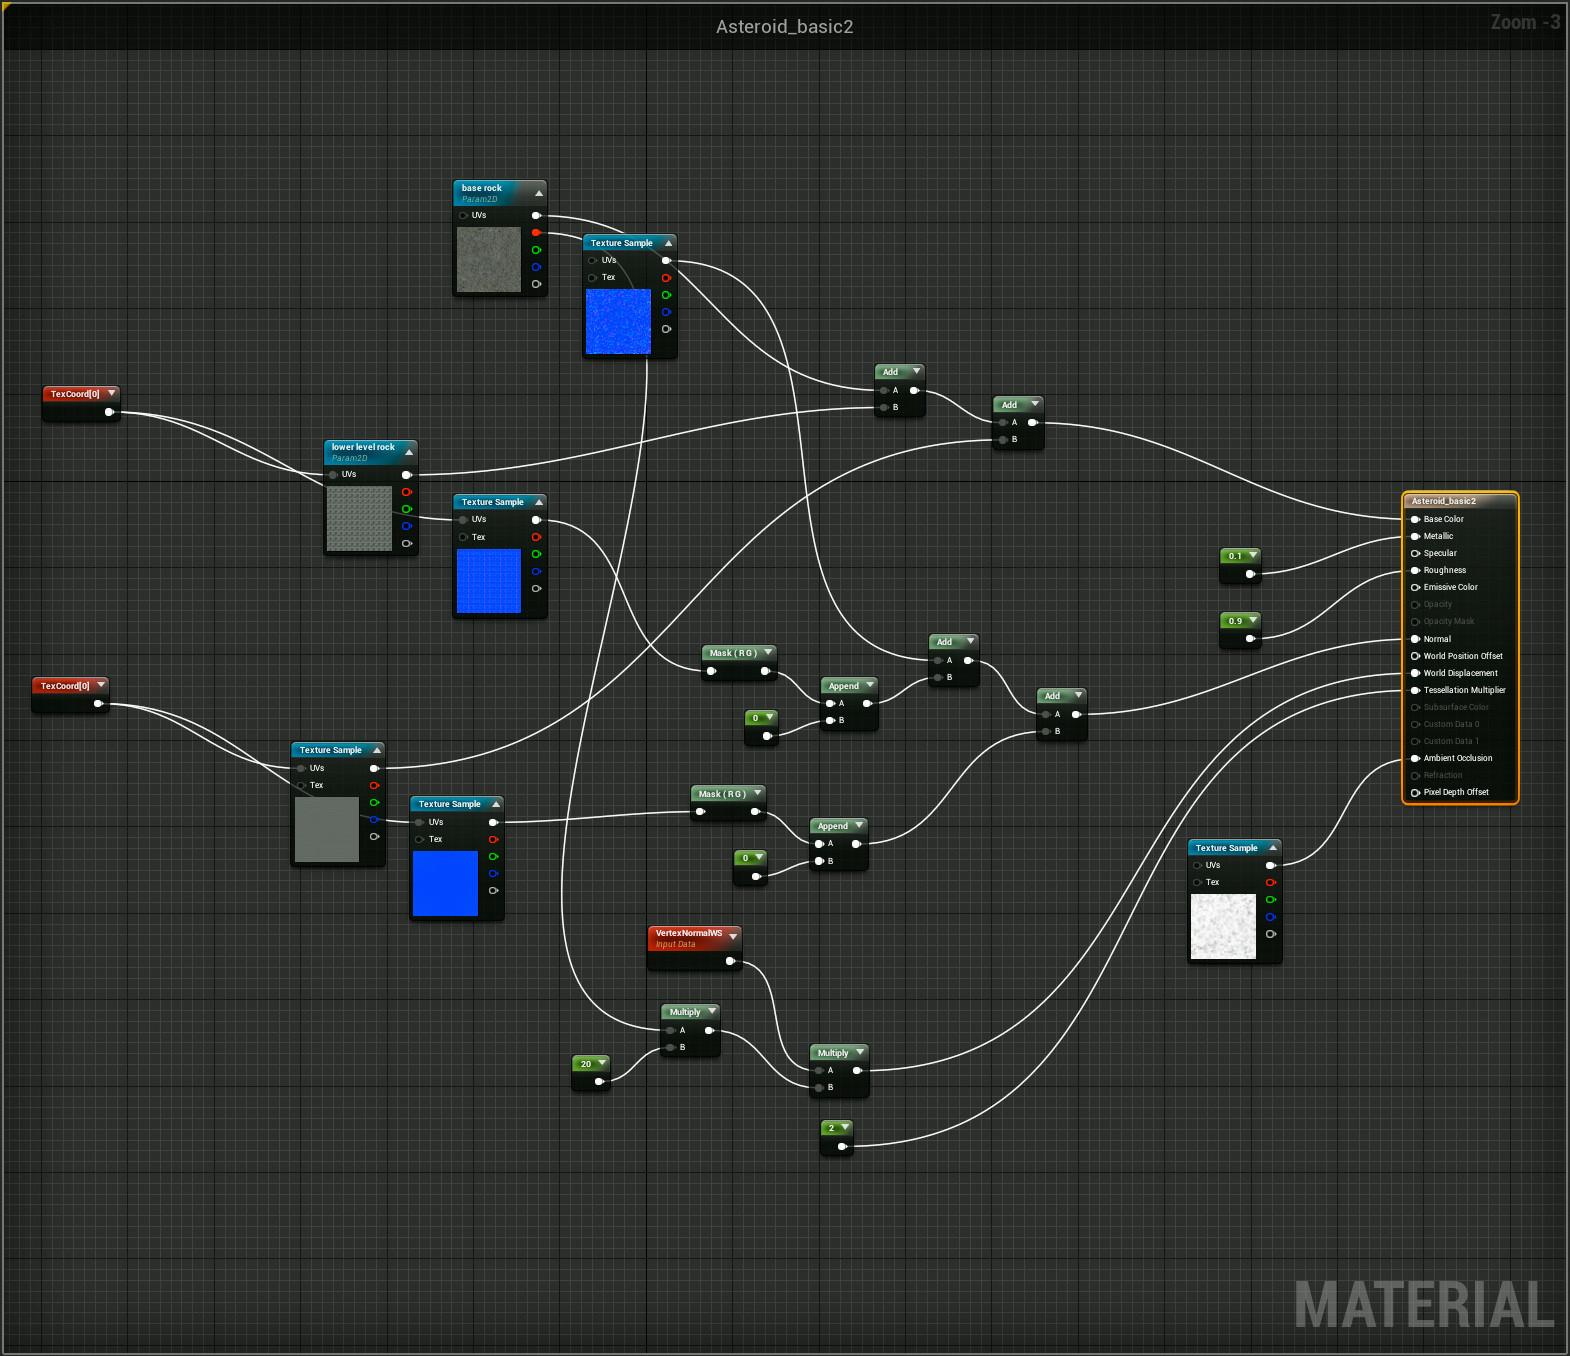 Johan de leenheer ue4 material nodes